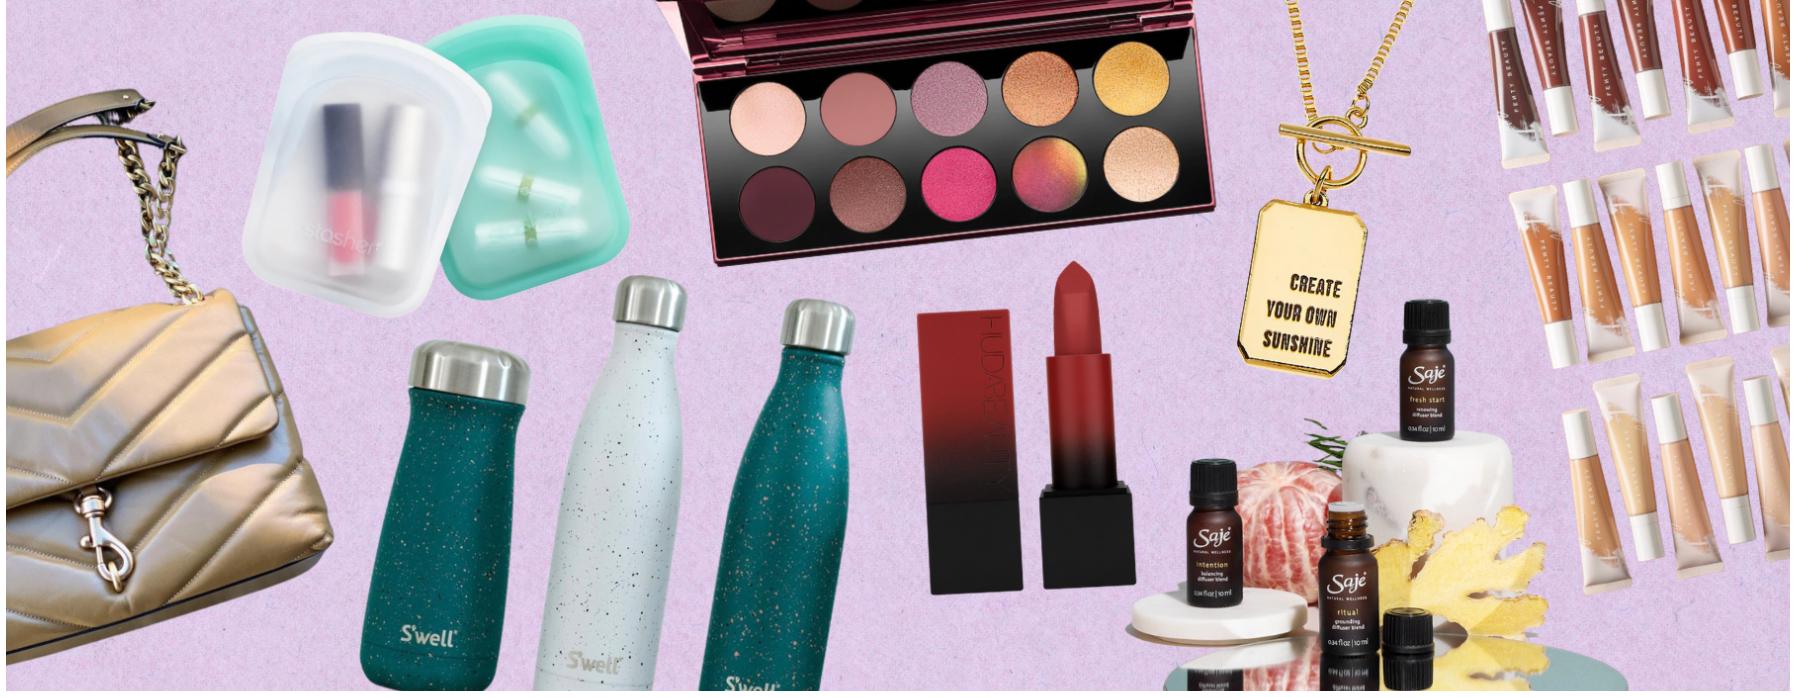 Purse, makeup, water bottles, Saje rollons